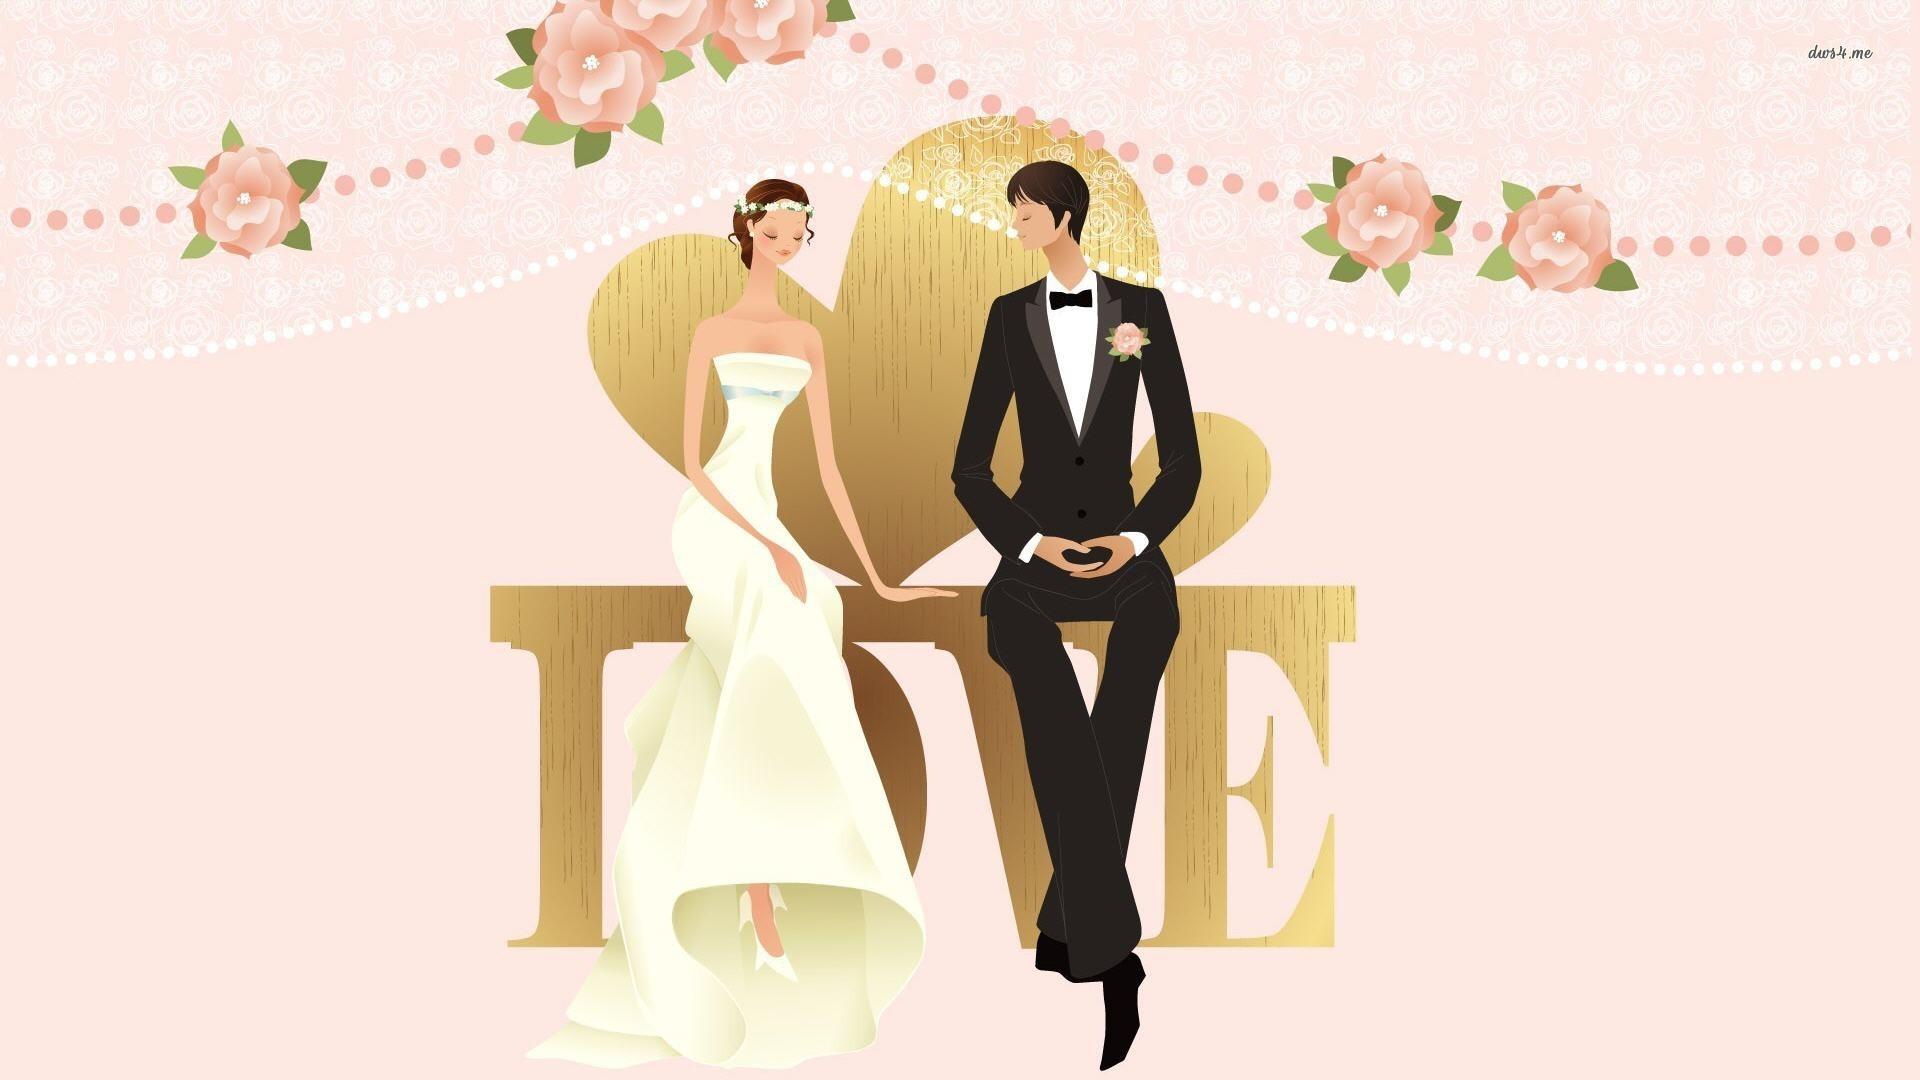 Couple Wedding Vector - Couple Wedding Vector